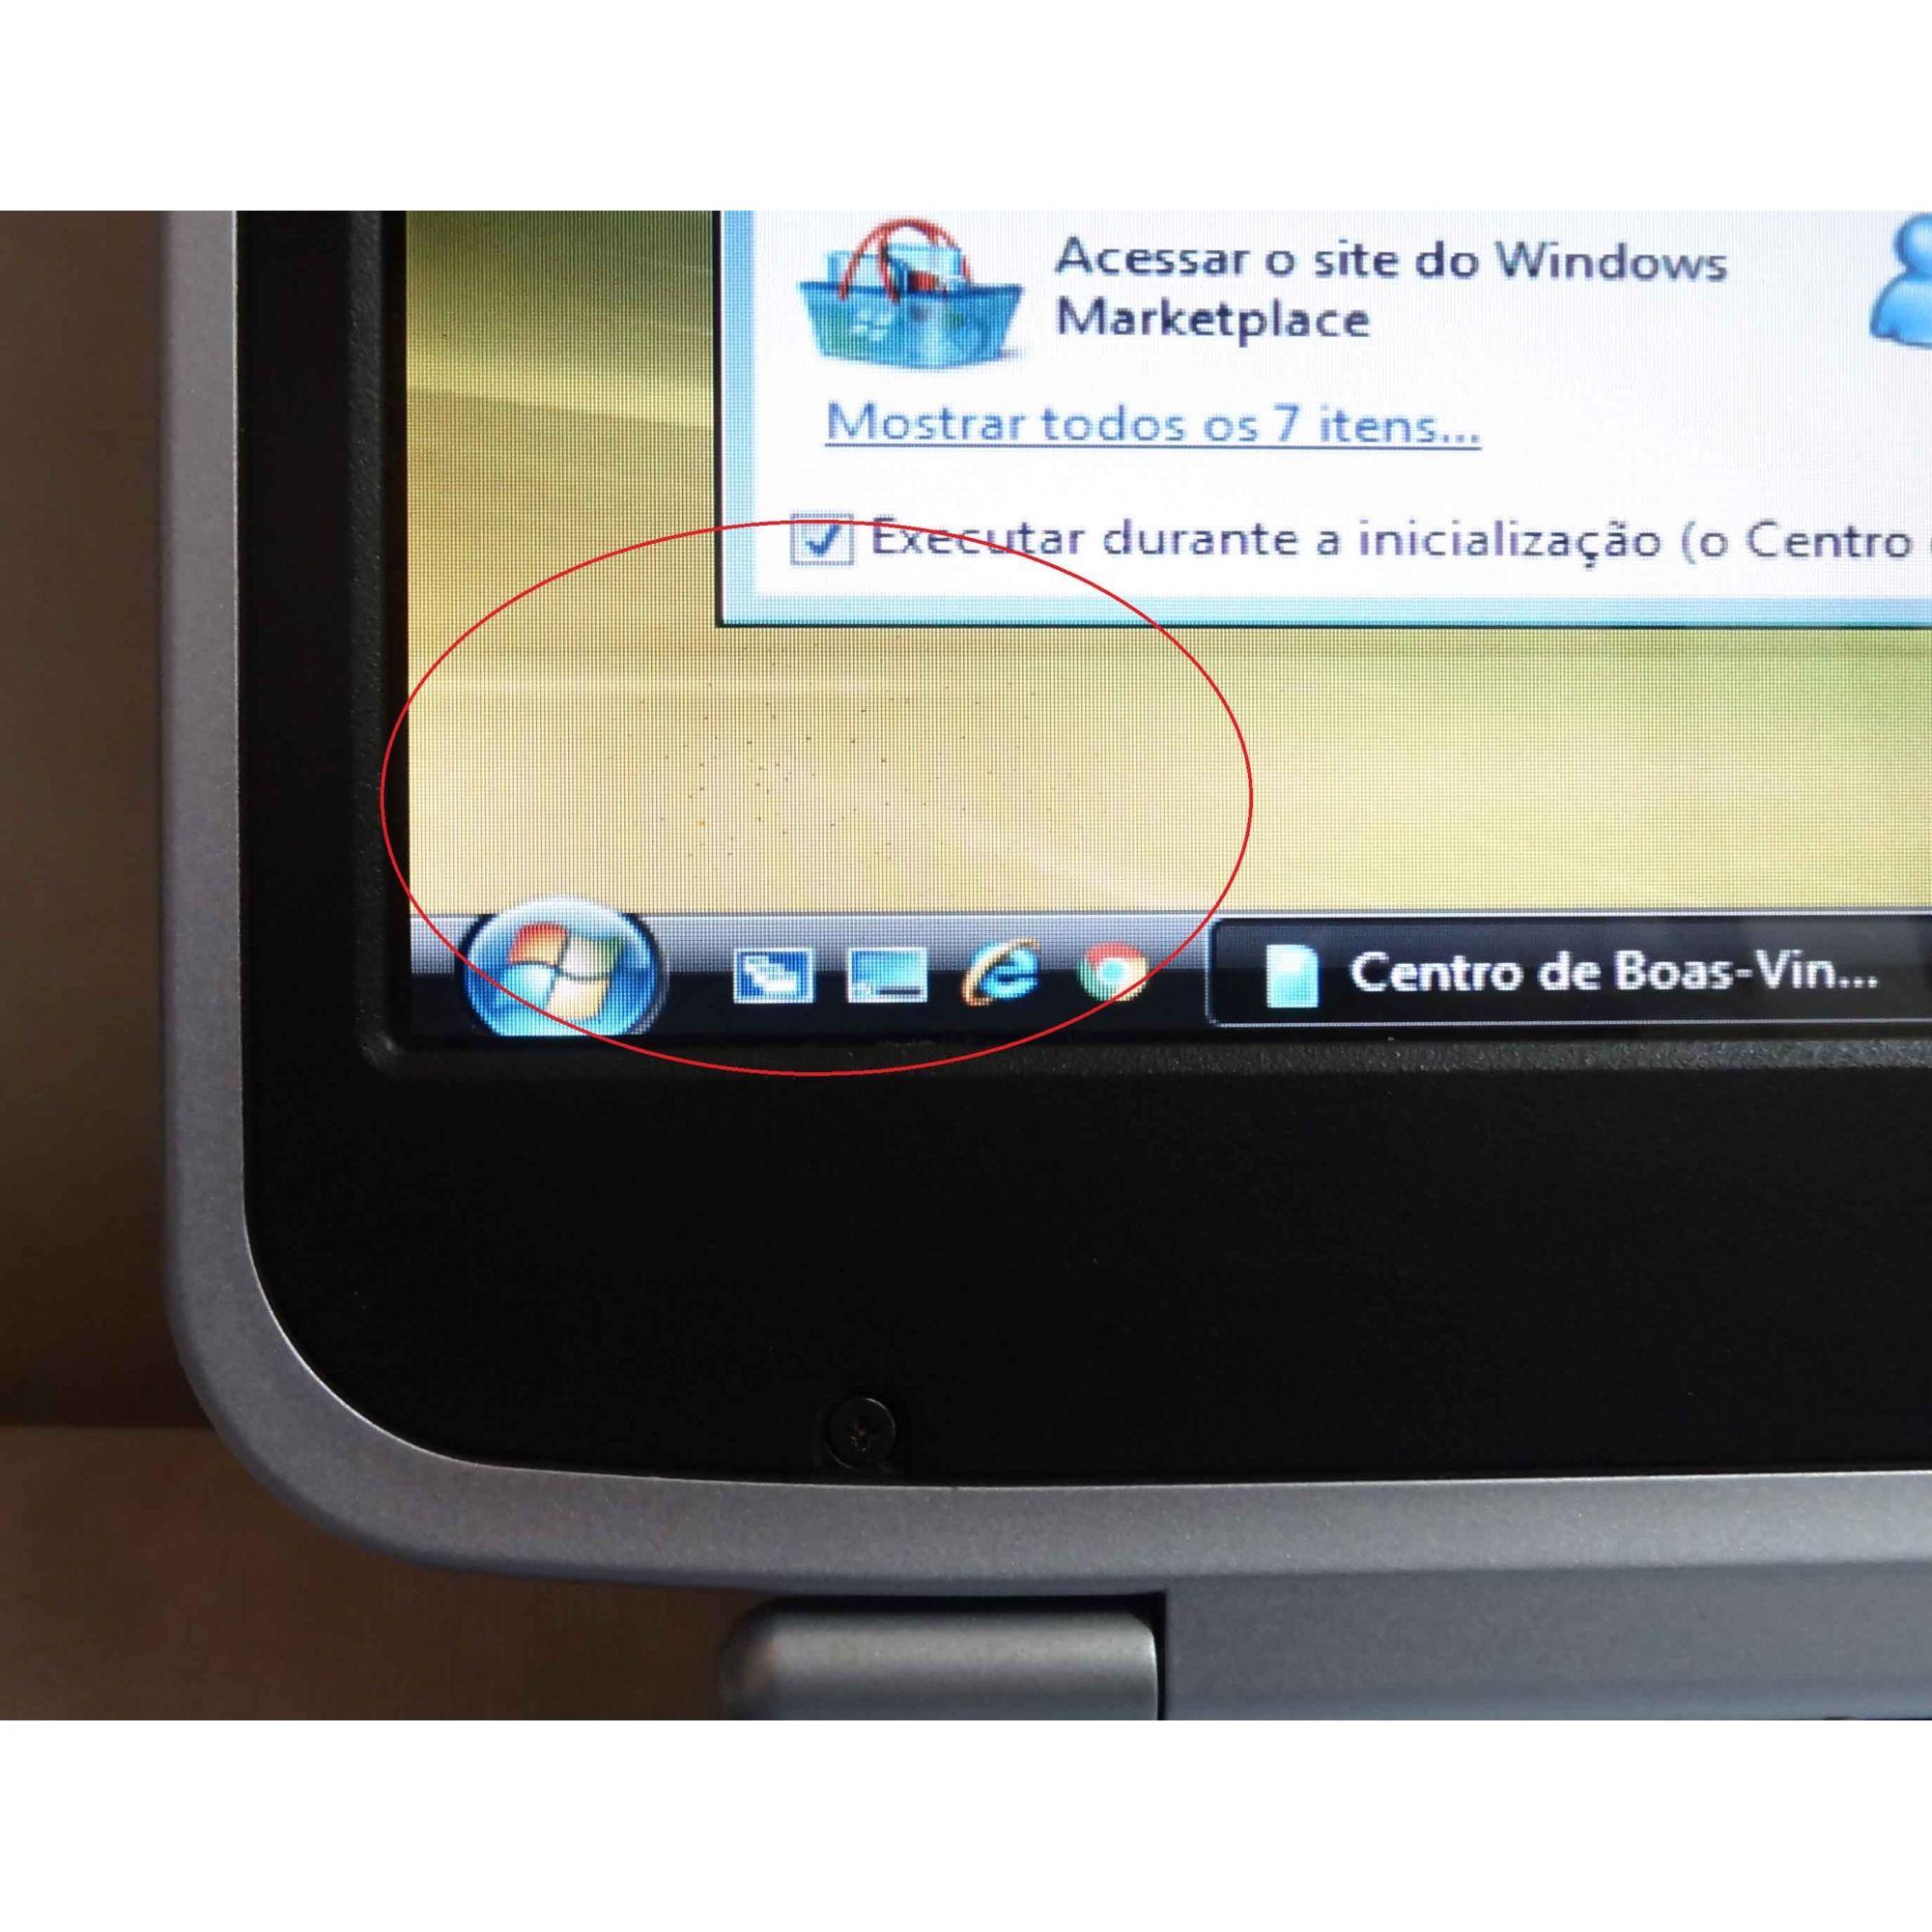 "Notebook HP Pavilion zv5000 c/Porta Paralela 15,4"" AMD Athlon 2GHz 1,5GB 80GB (NÃO ENVIAMOS)"